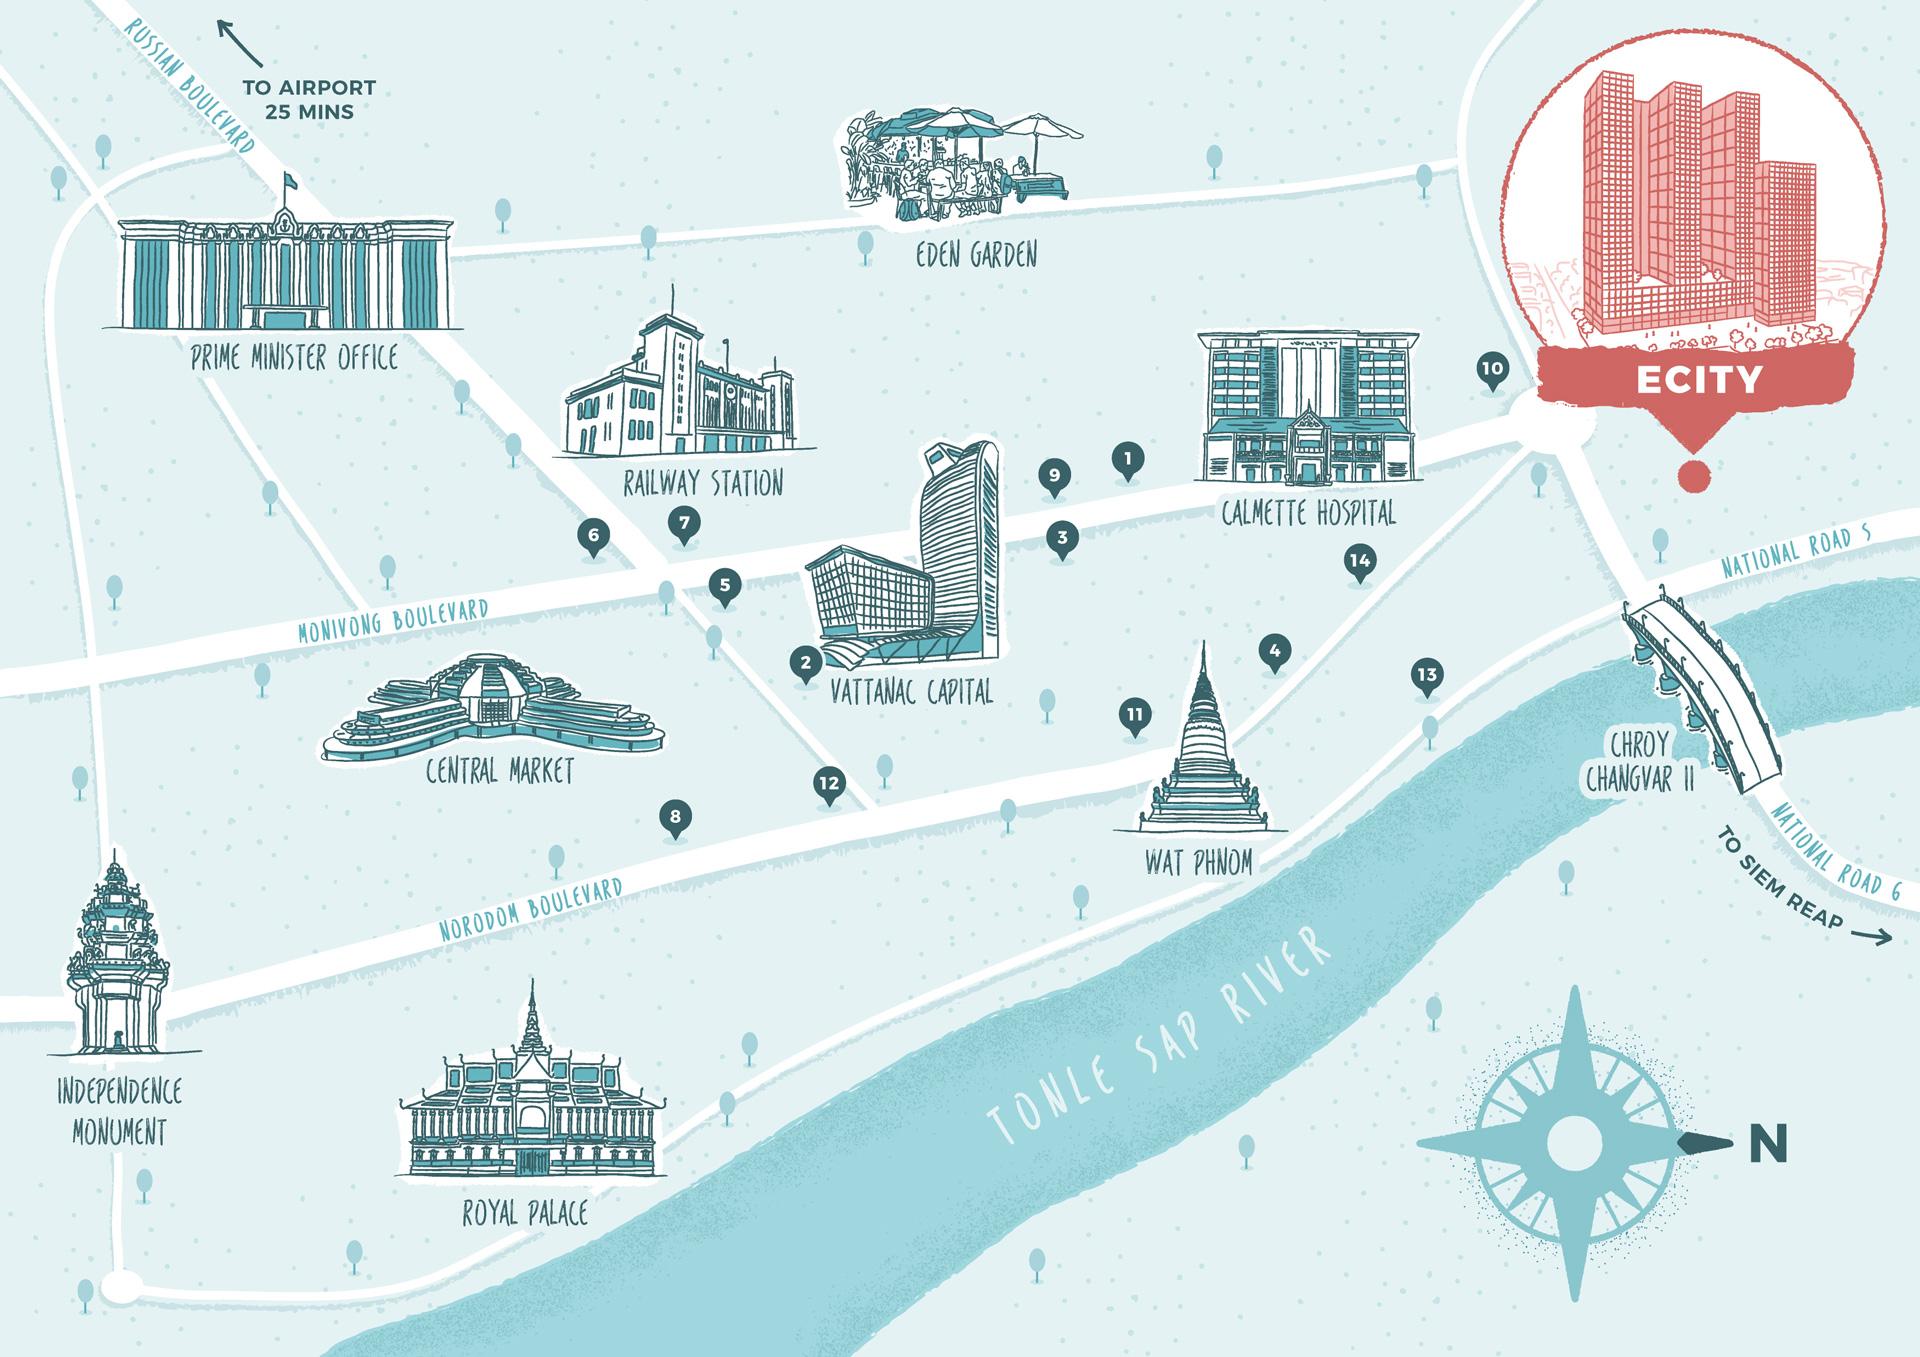 Phnom Penh city illustrated map